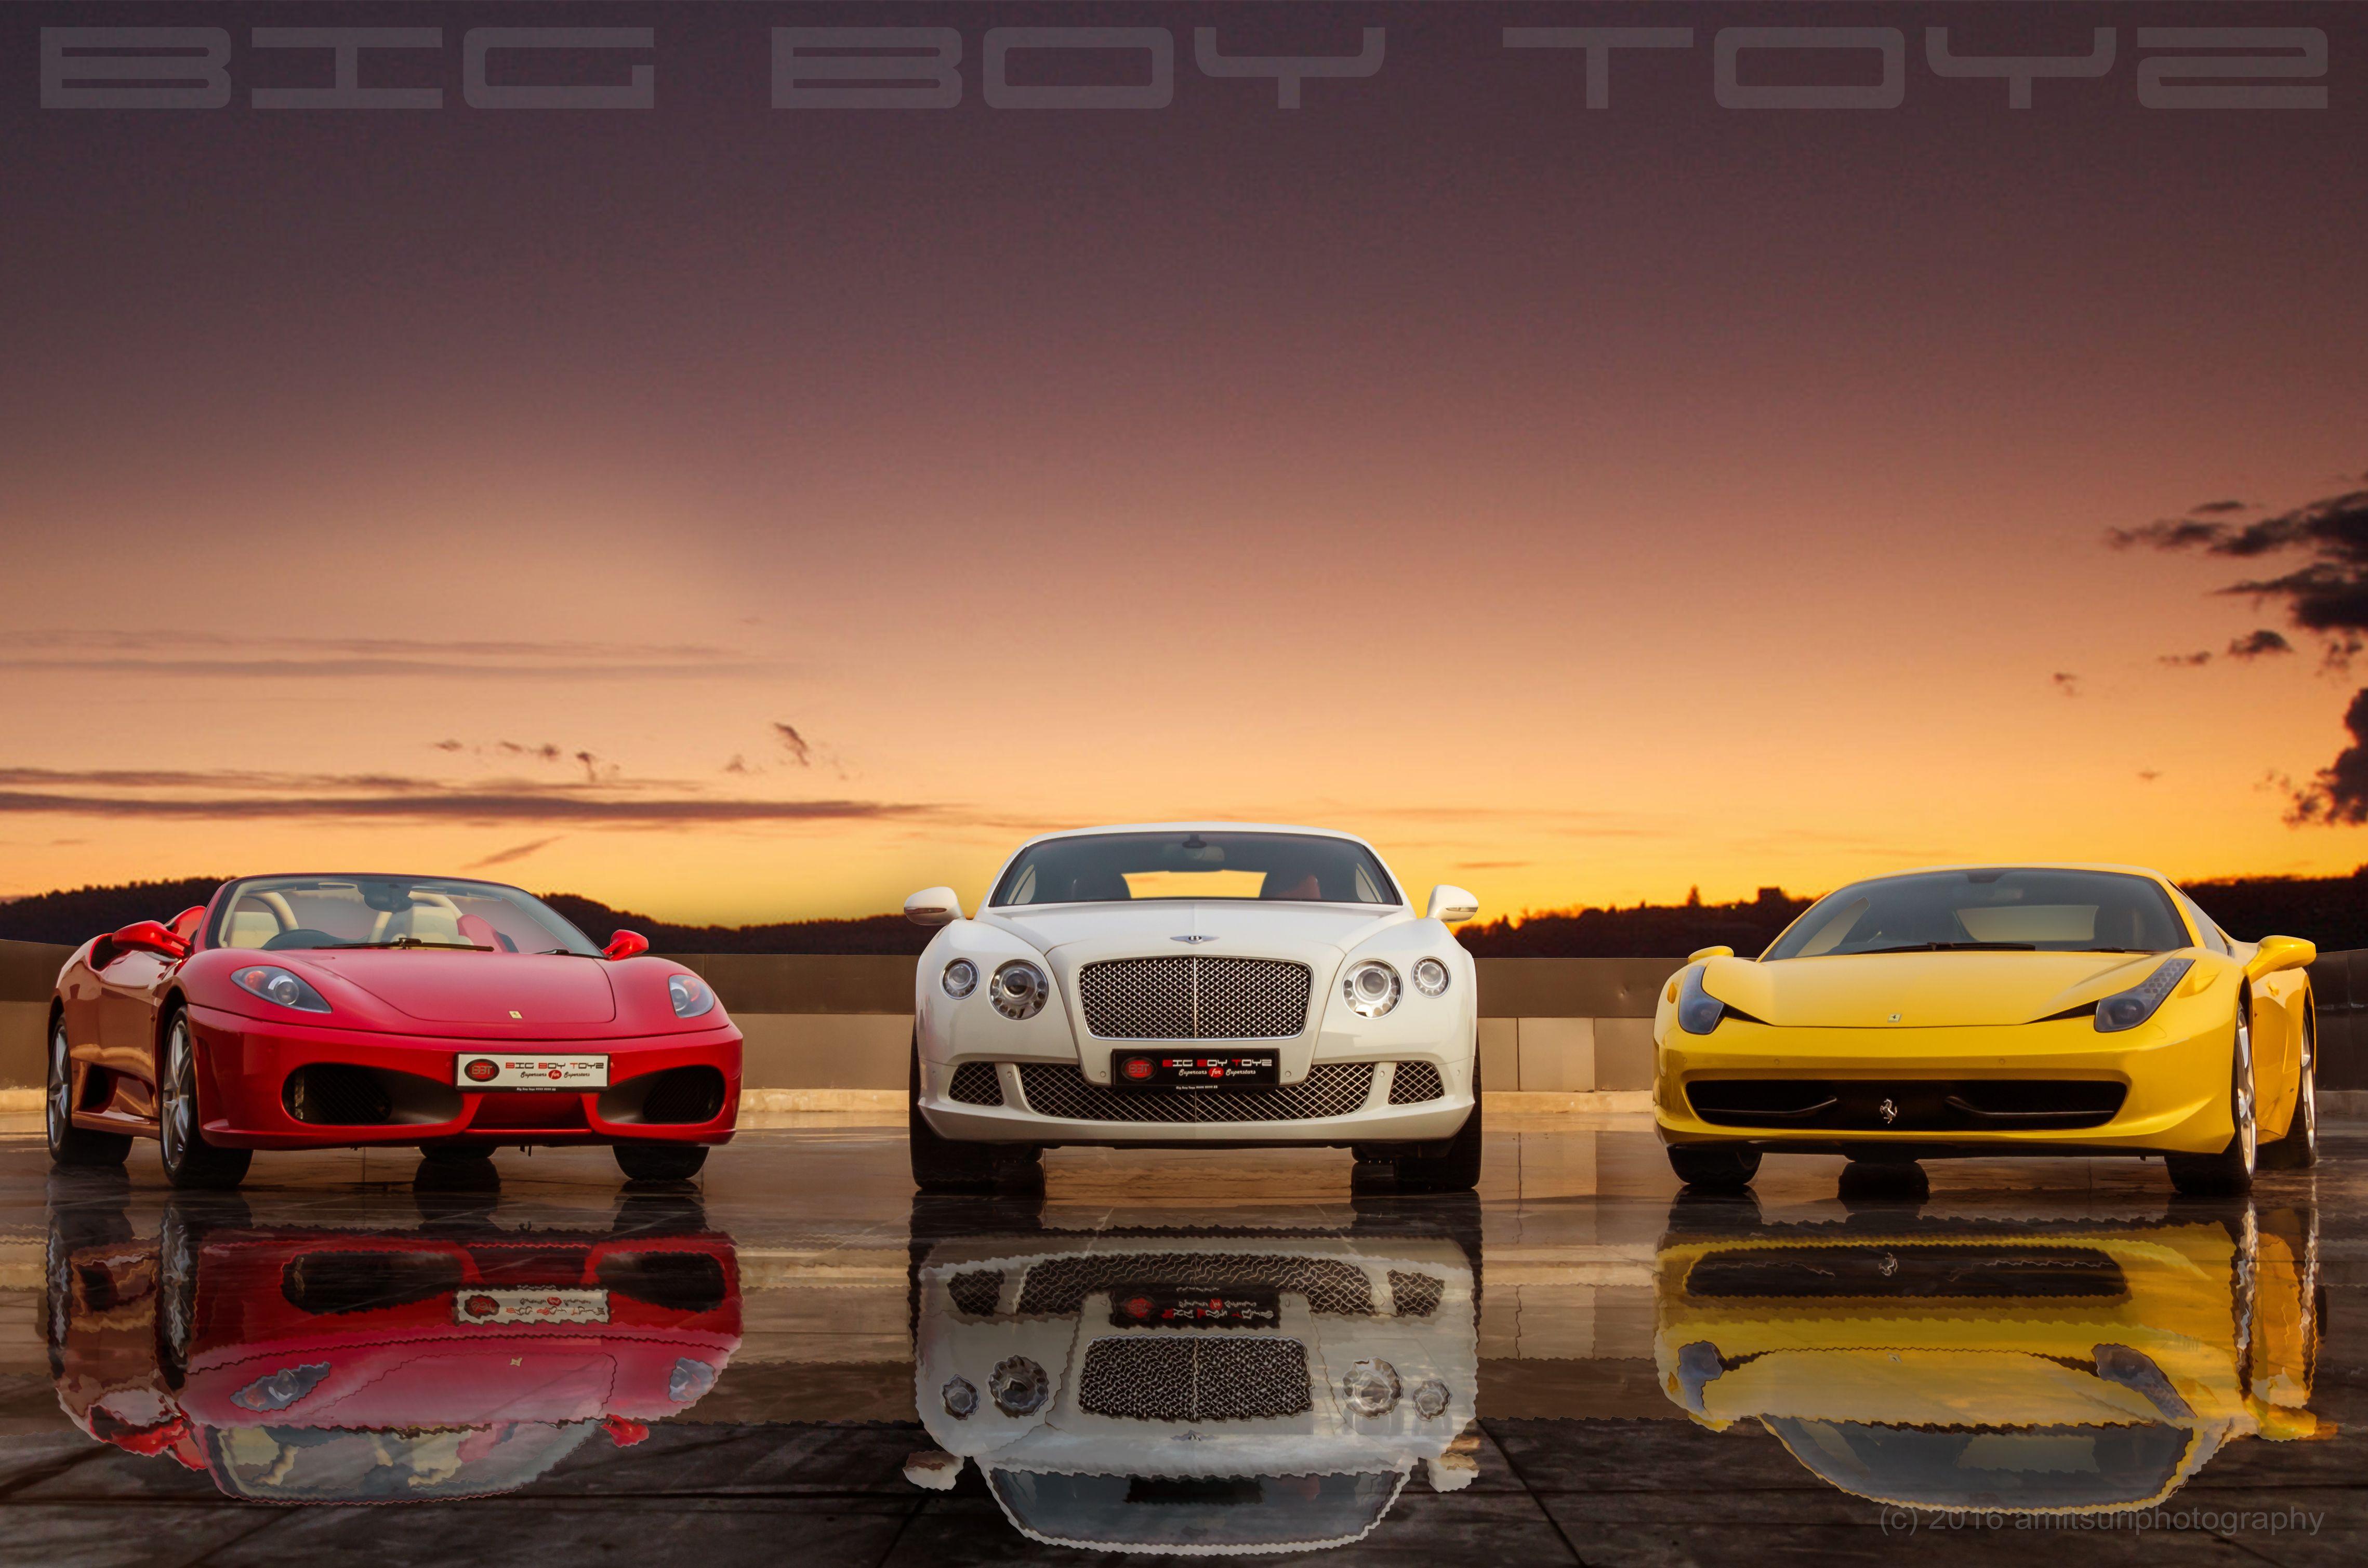 Poster Shoot For Big Boy Toyz India Automotive Photography Big Boys Photography